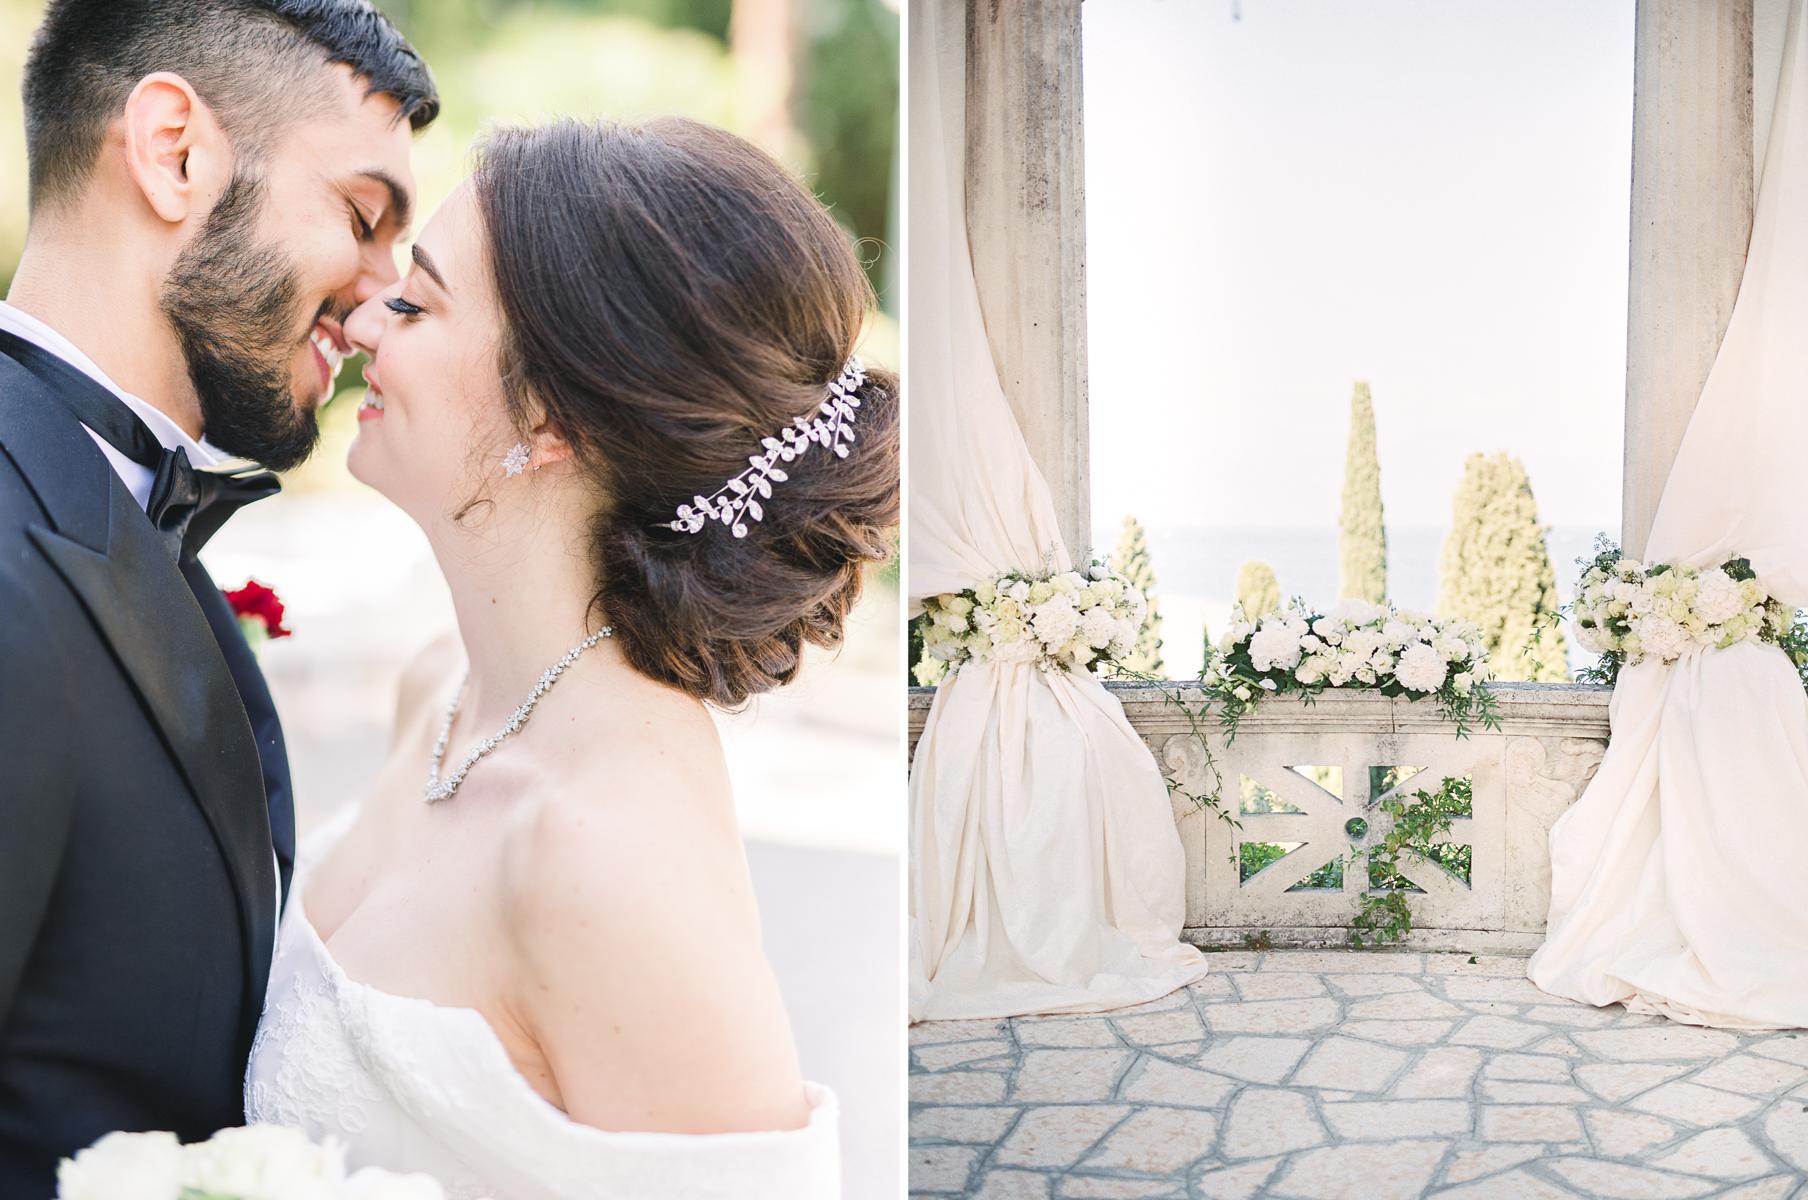 Palace_Villa_Cortine_Hotel_Italian_Wedding_Photographer_Sirmione_AKP-34.jpg